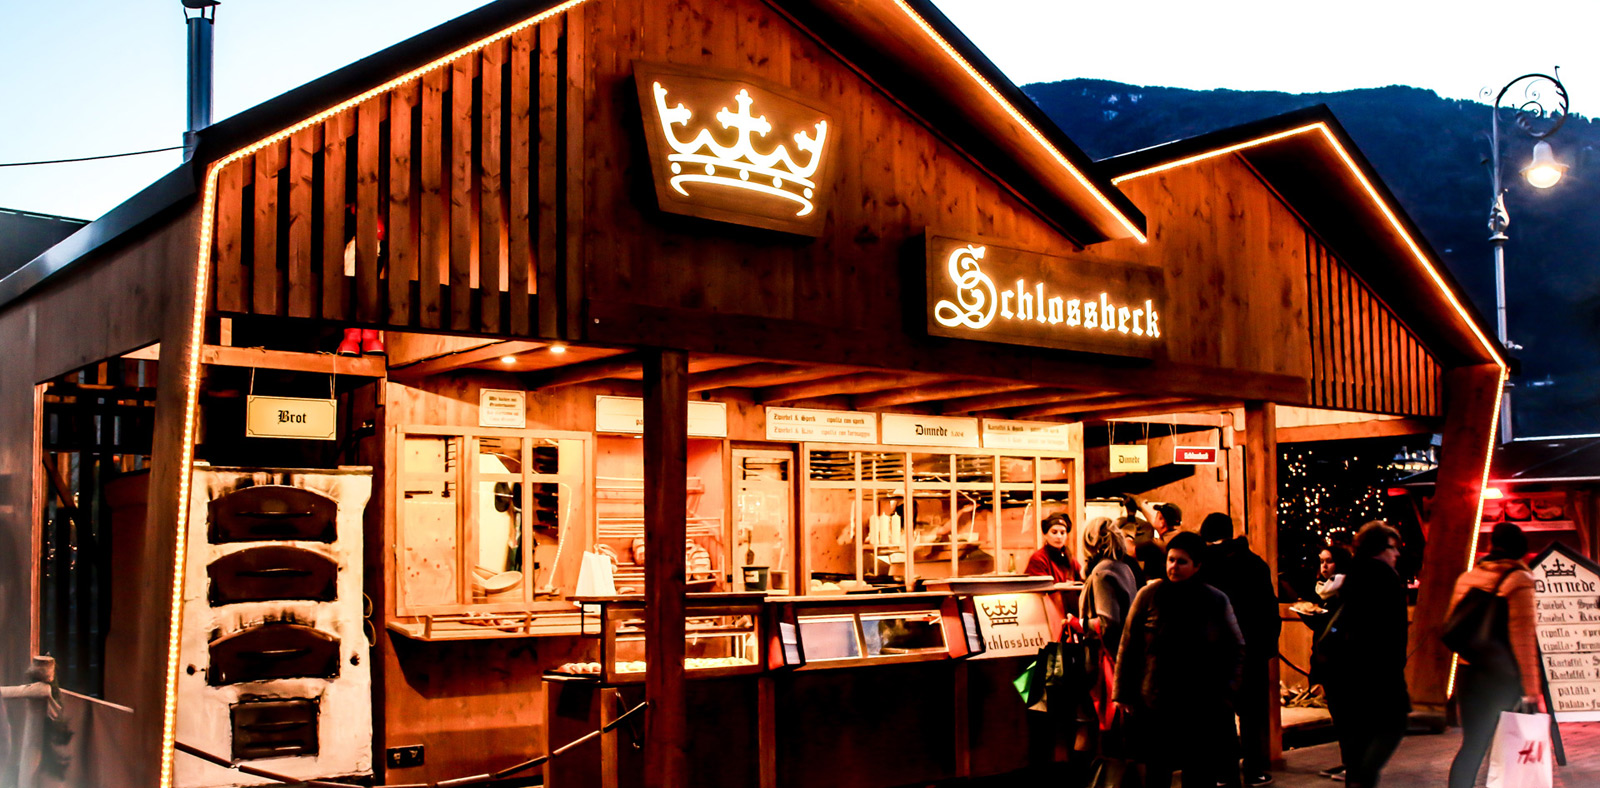 Dinnede Schlossbeck